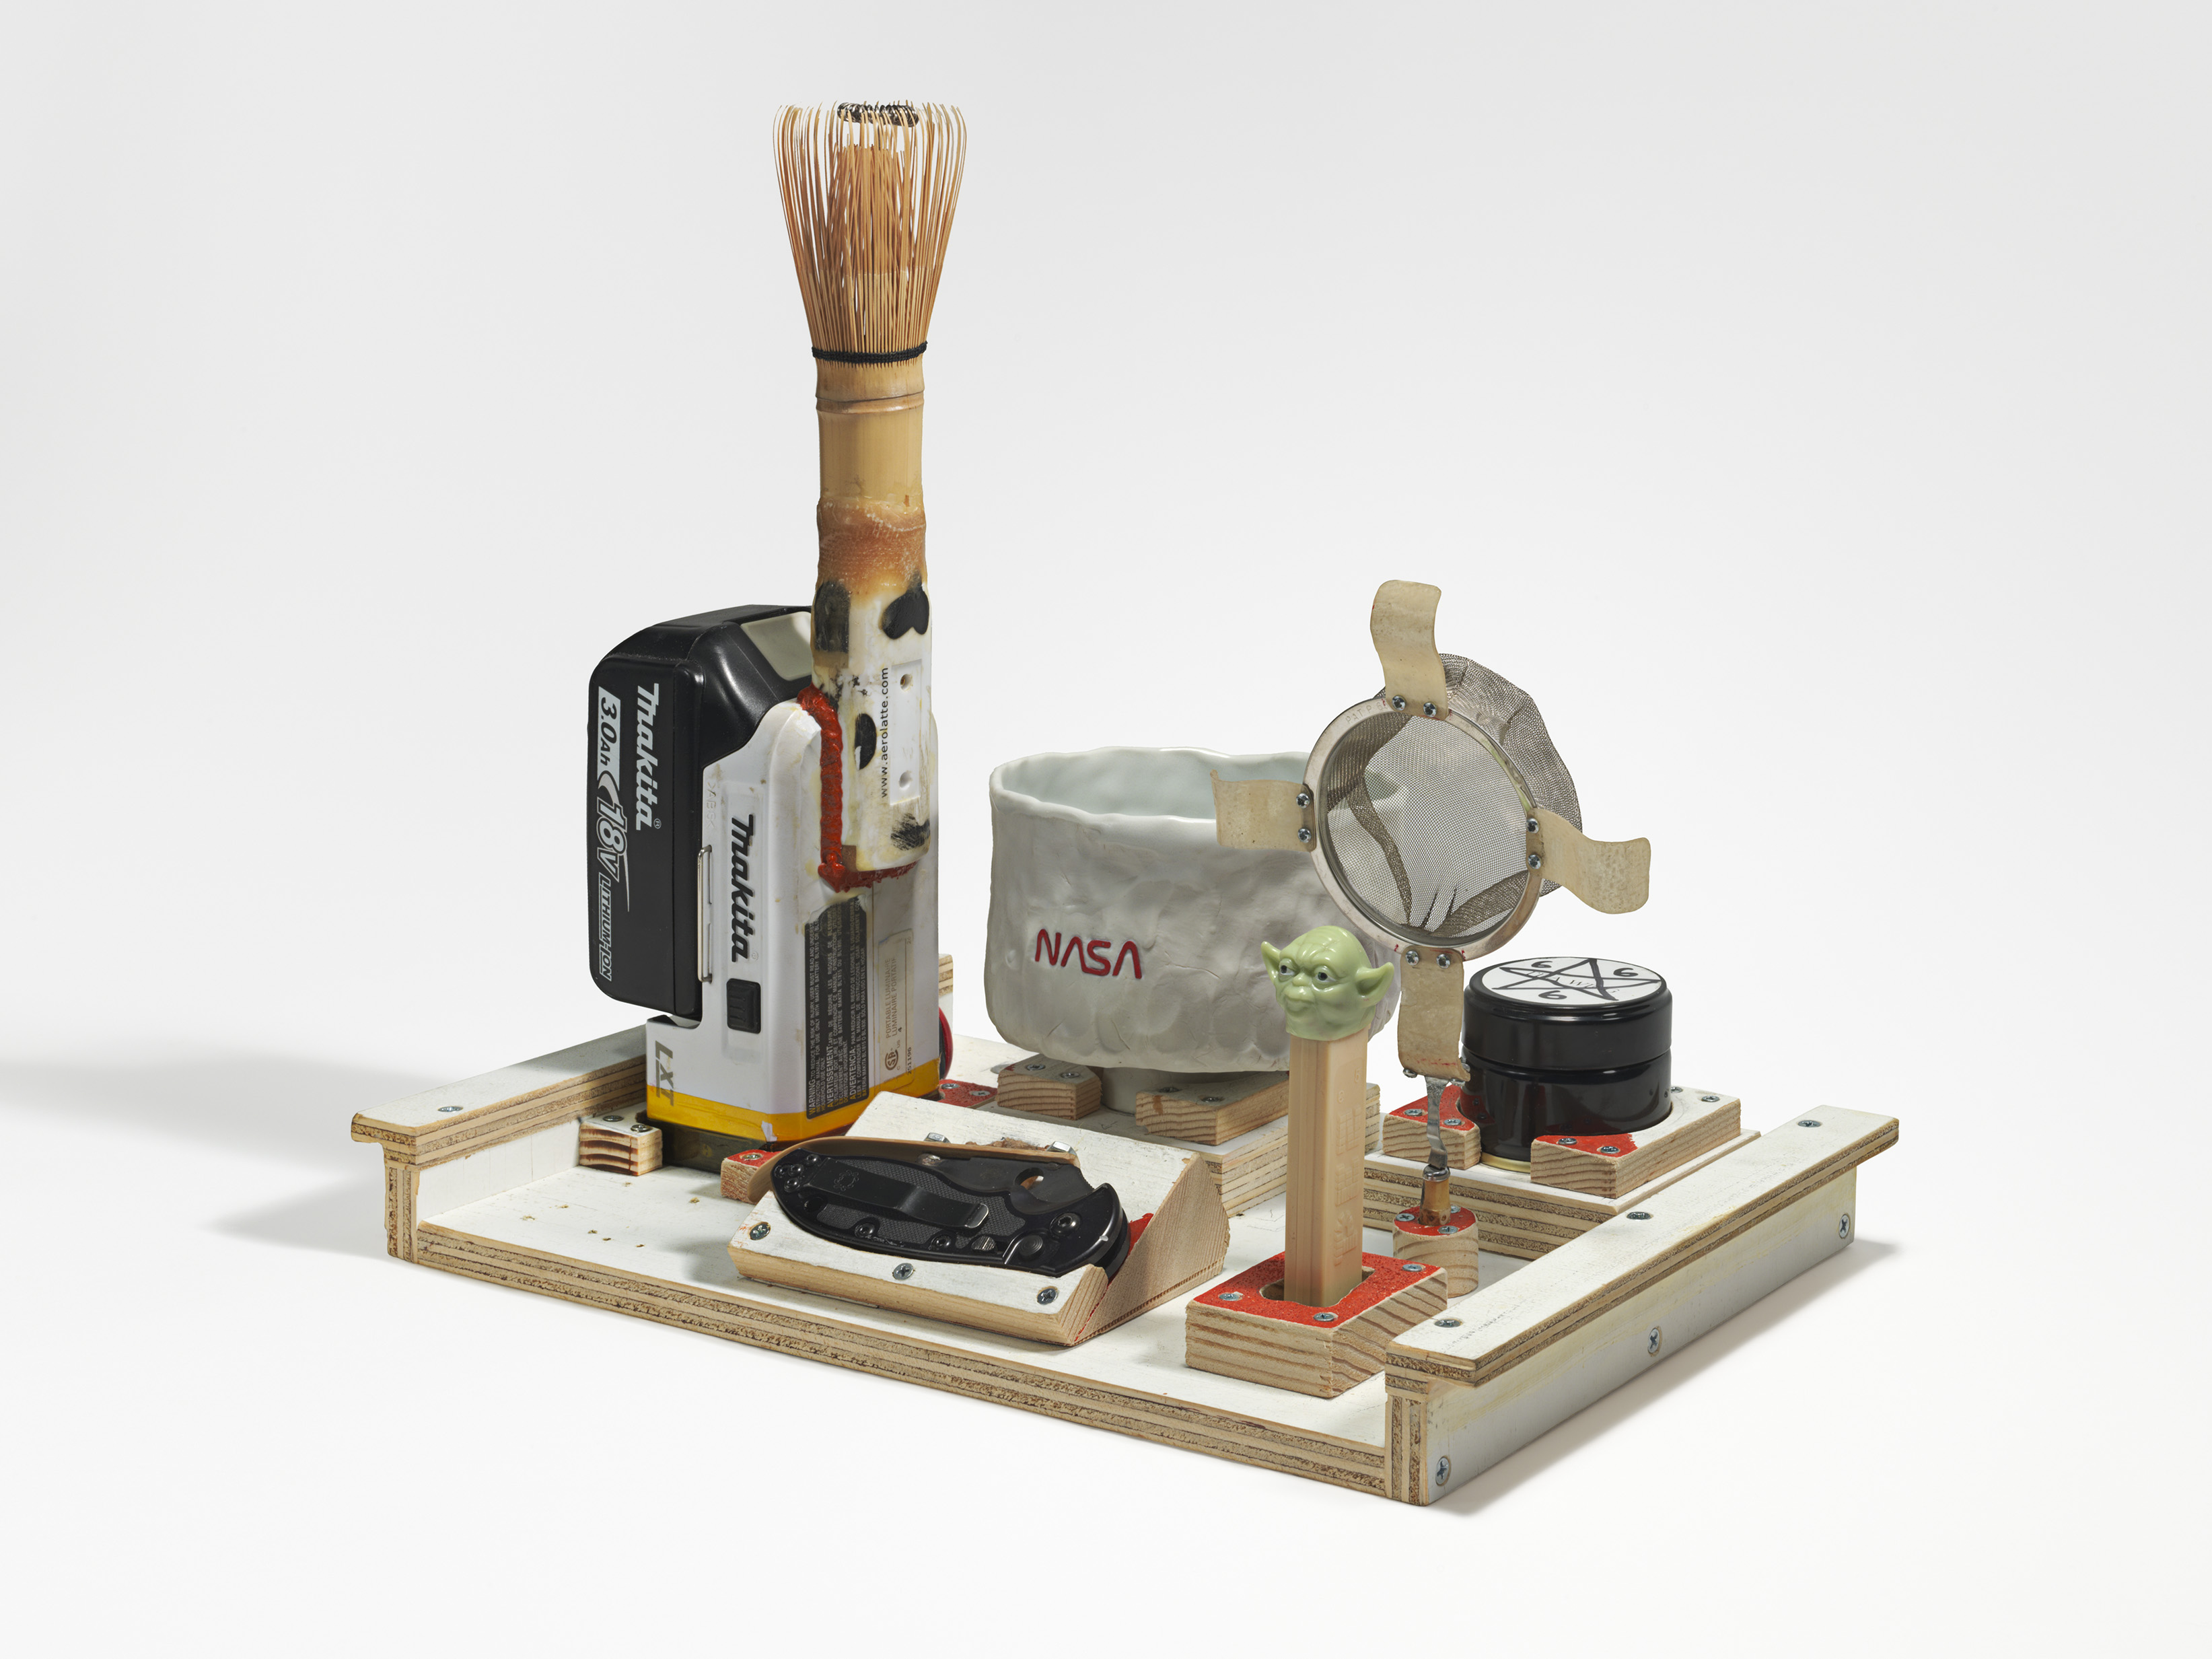 Chabako (tea utensils), 2015. 12.375 H x 14.25 W x 9 D inches.